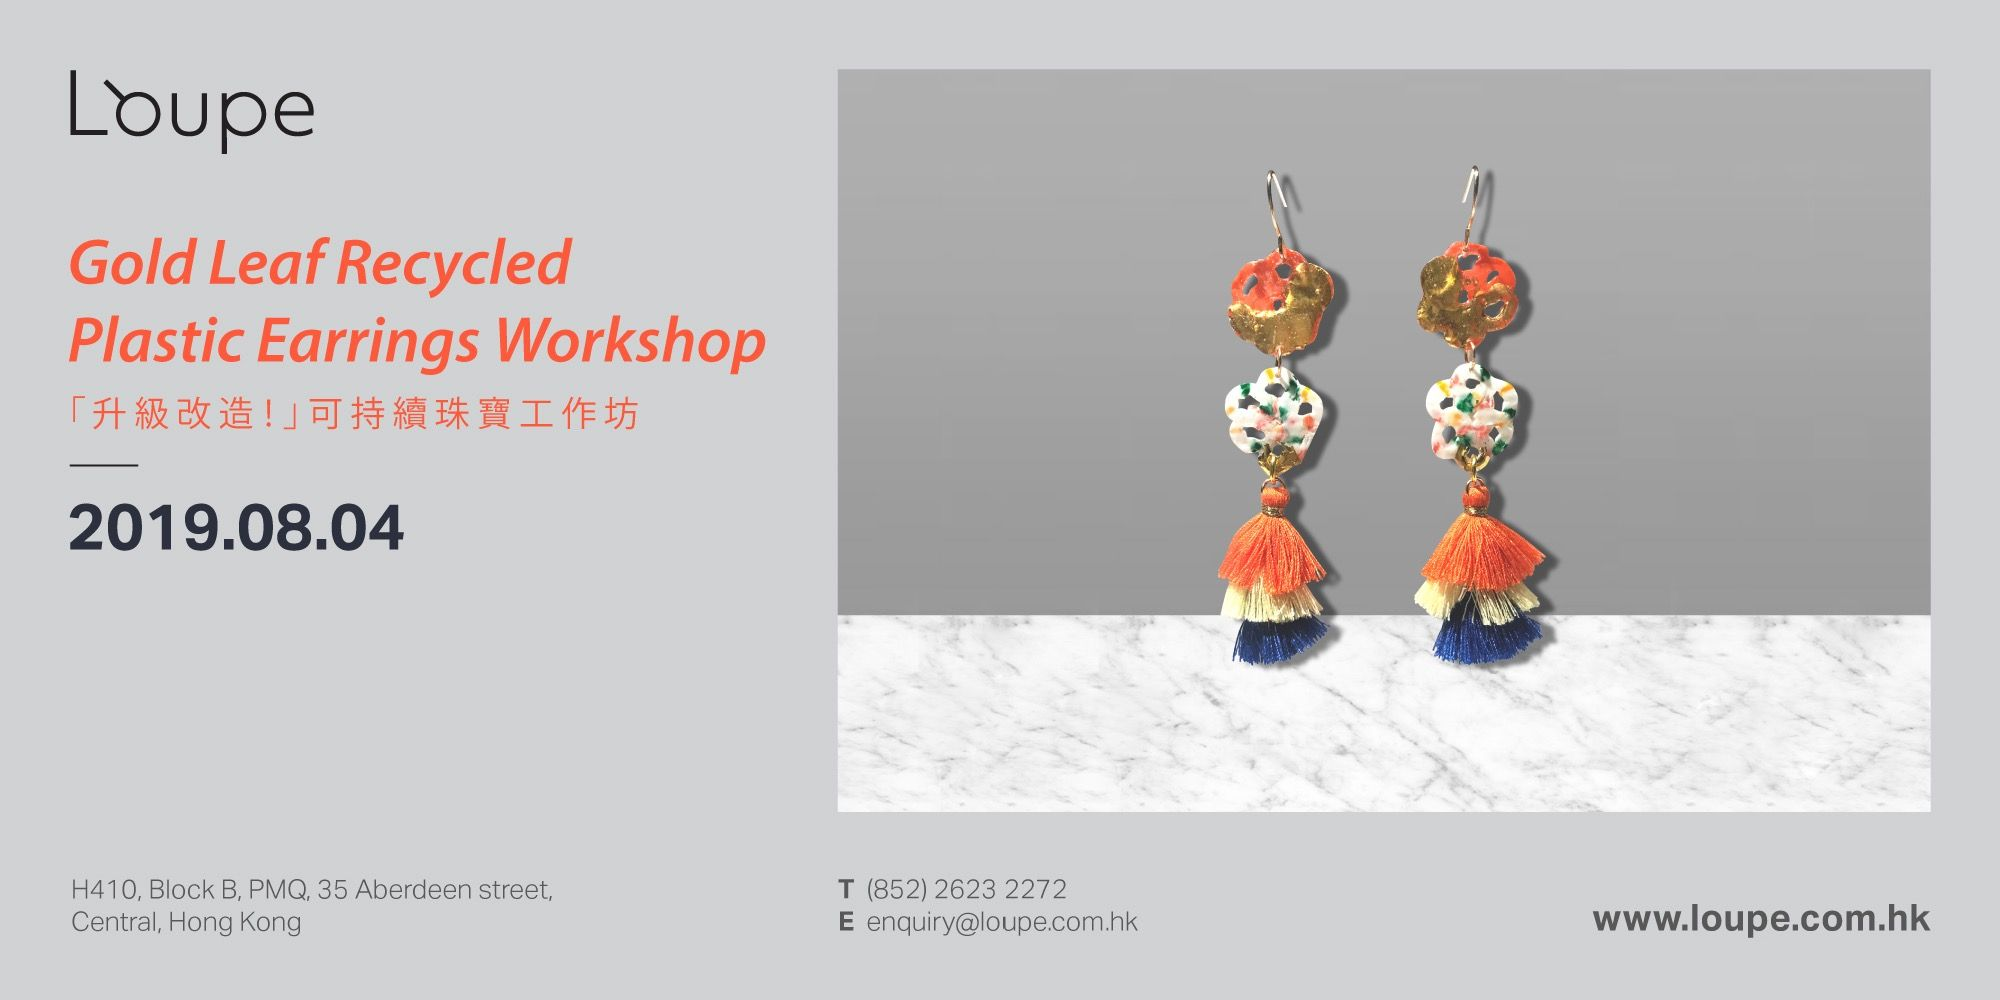 Gold Leaf Recycled Plastic Earrings Workshop 「升級改造!」可持續珠寶工作坊